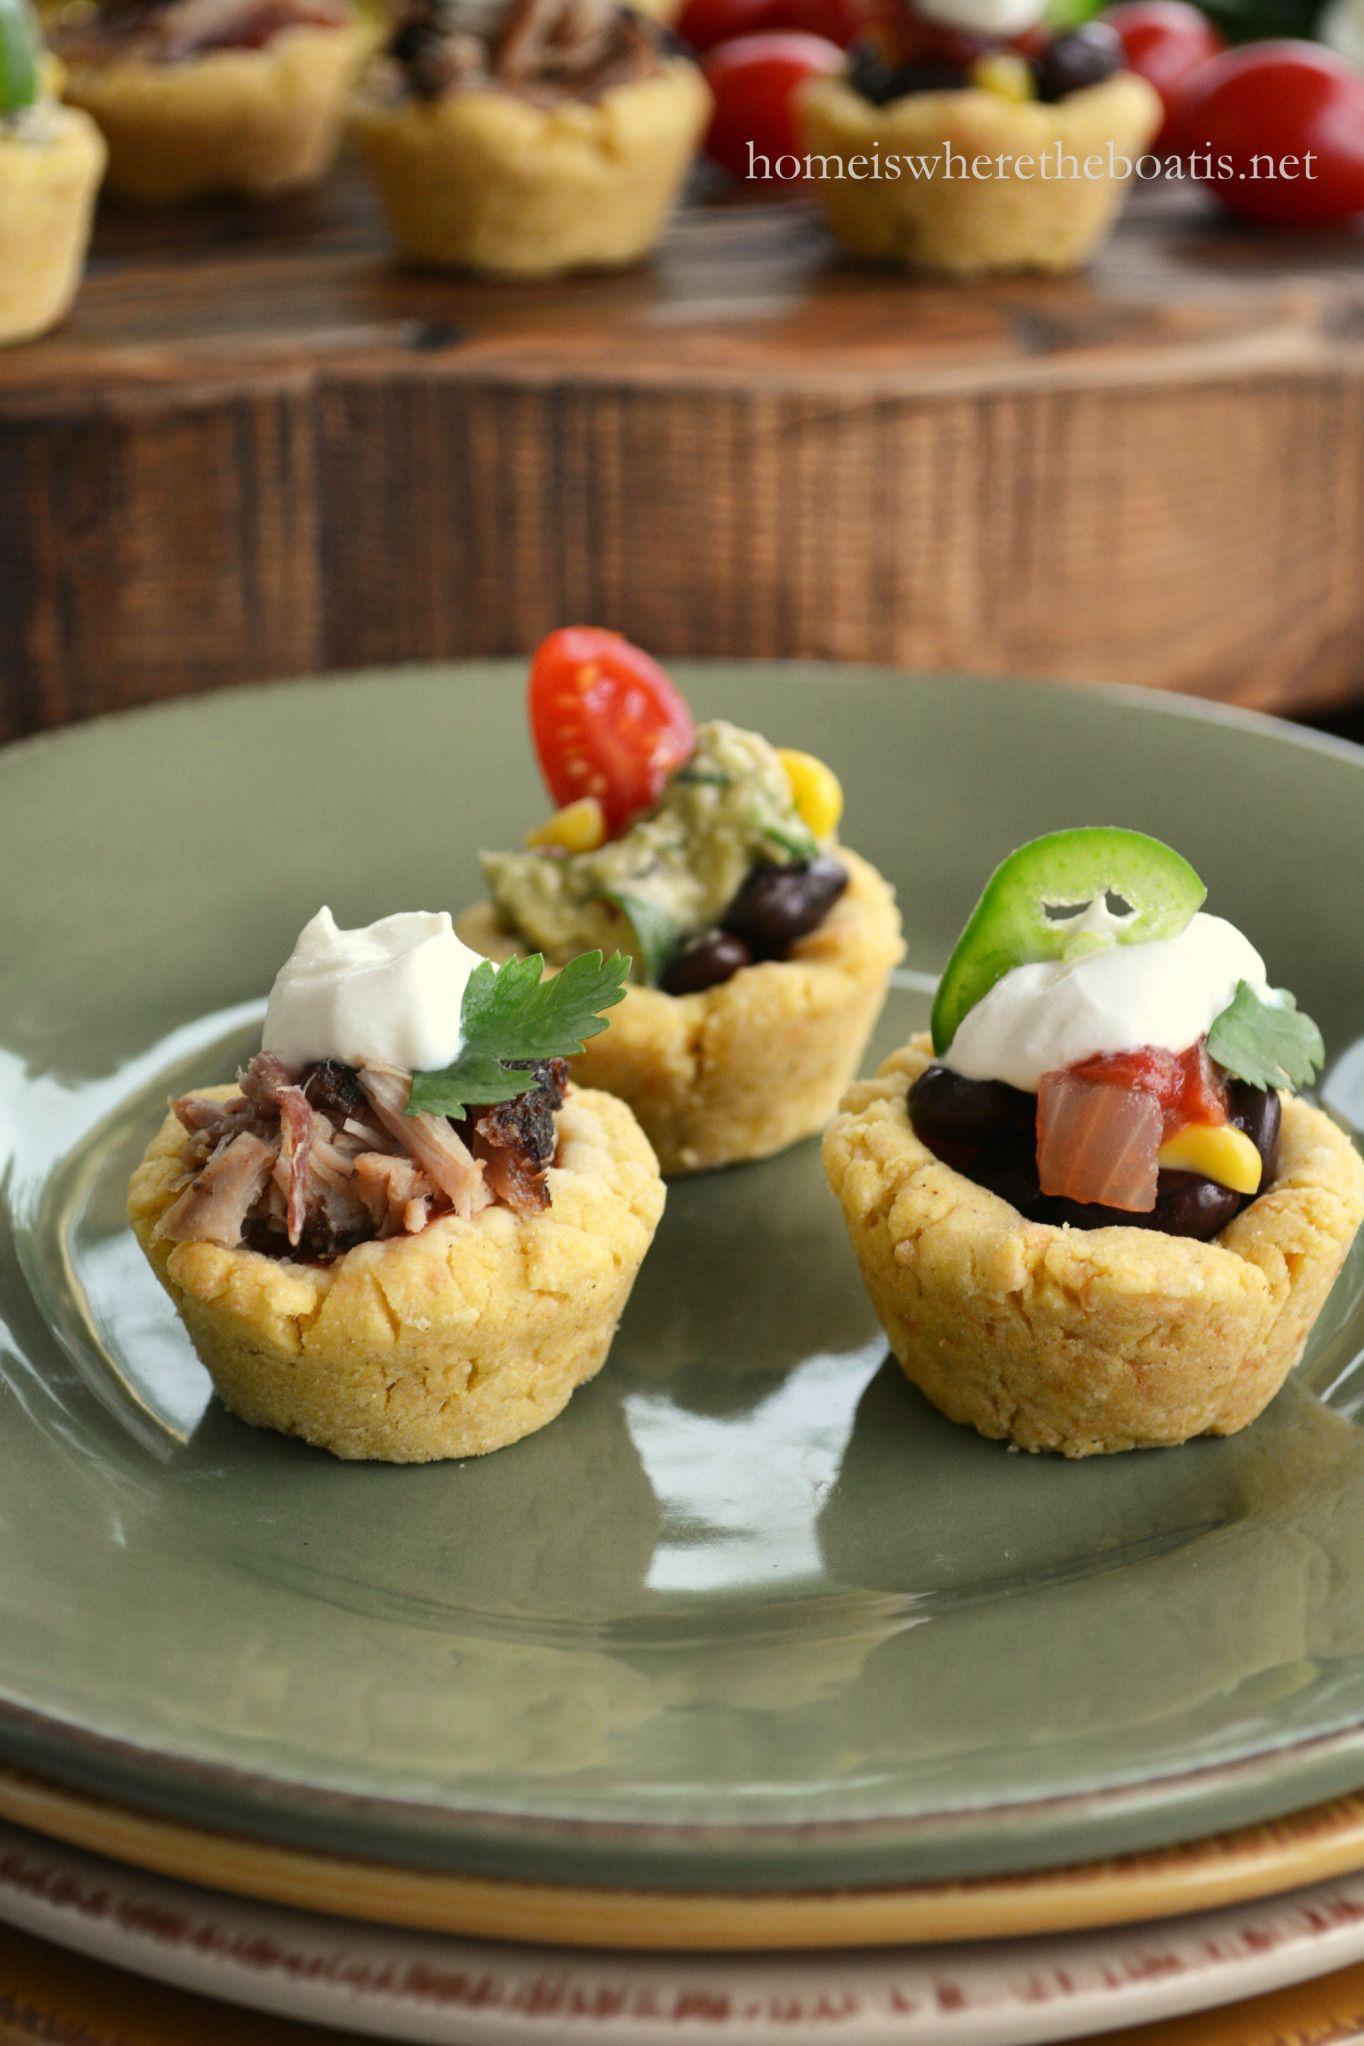 Cheesy Masa Cups for Cinco de Mayo | homeiswheretheboatis.net #cincodemayo #fiesta #appetizer